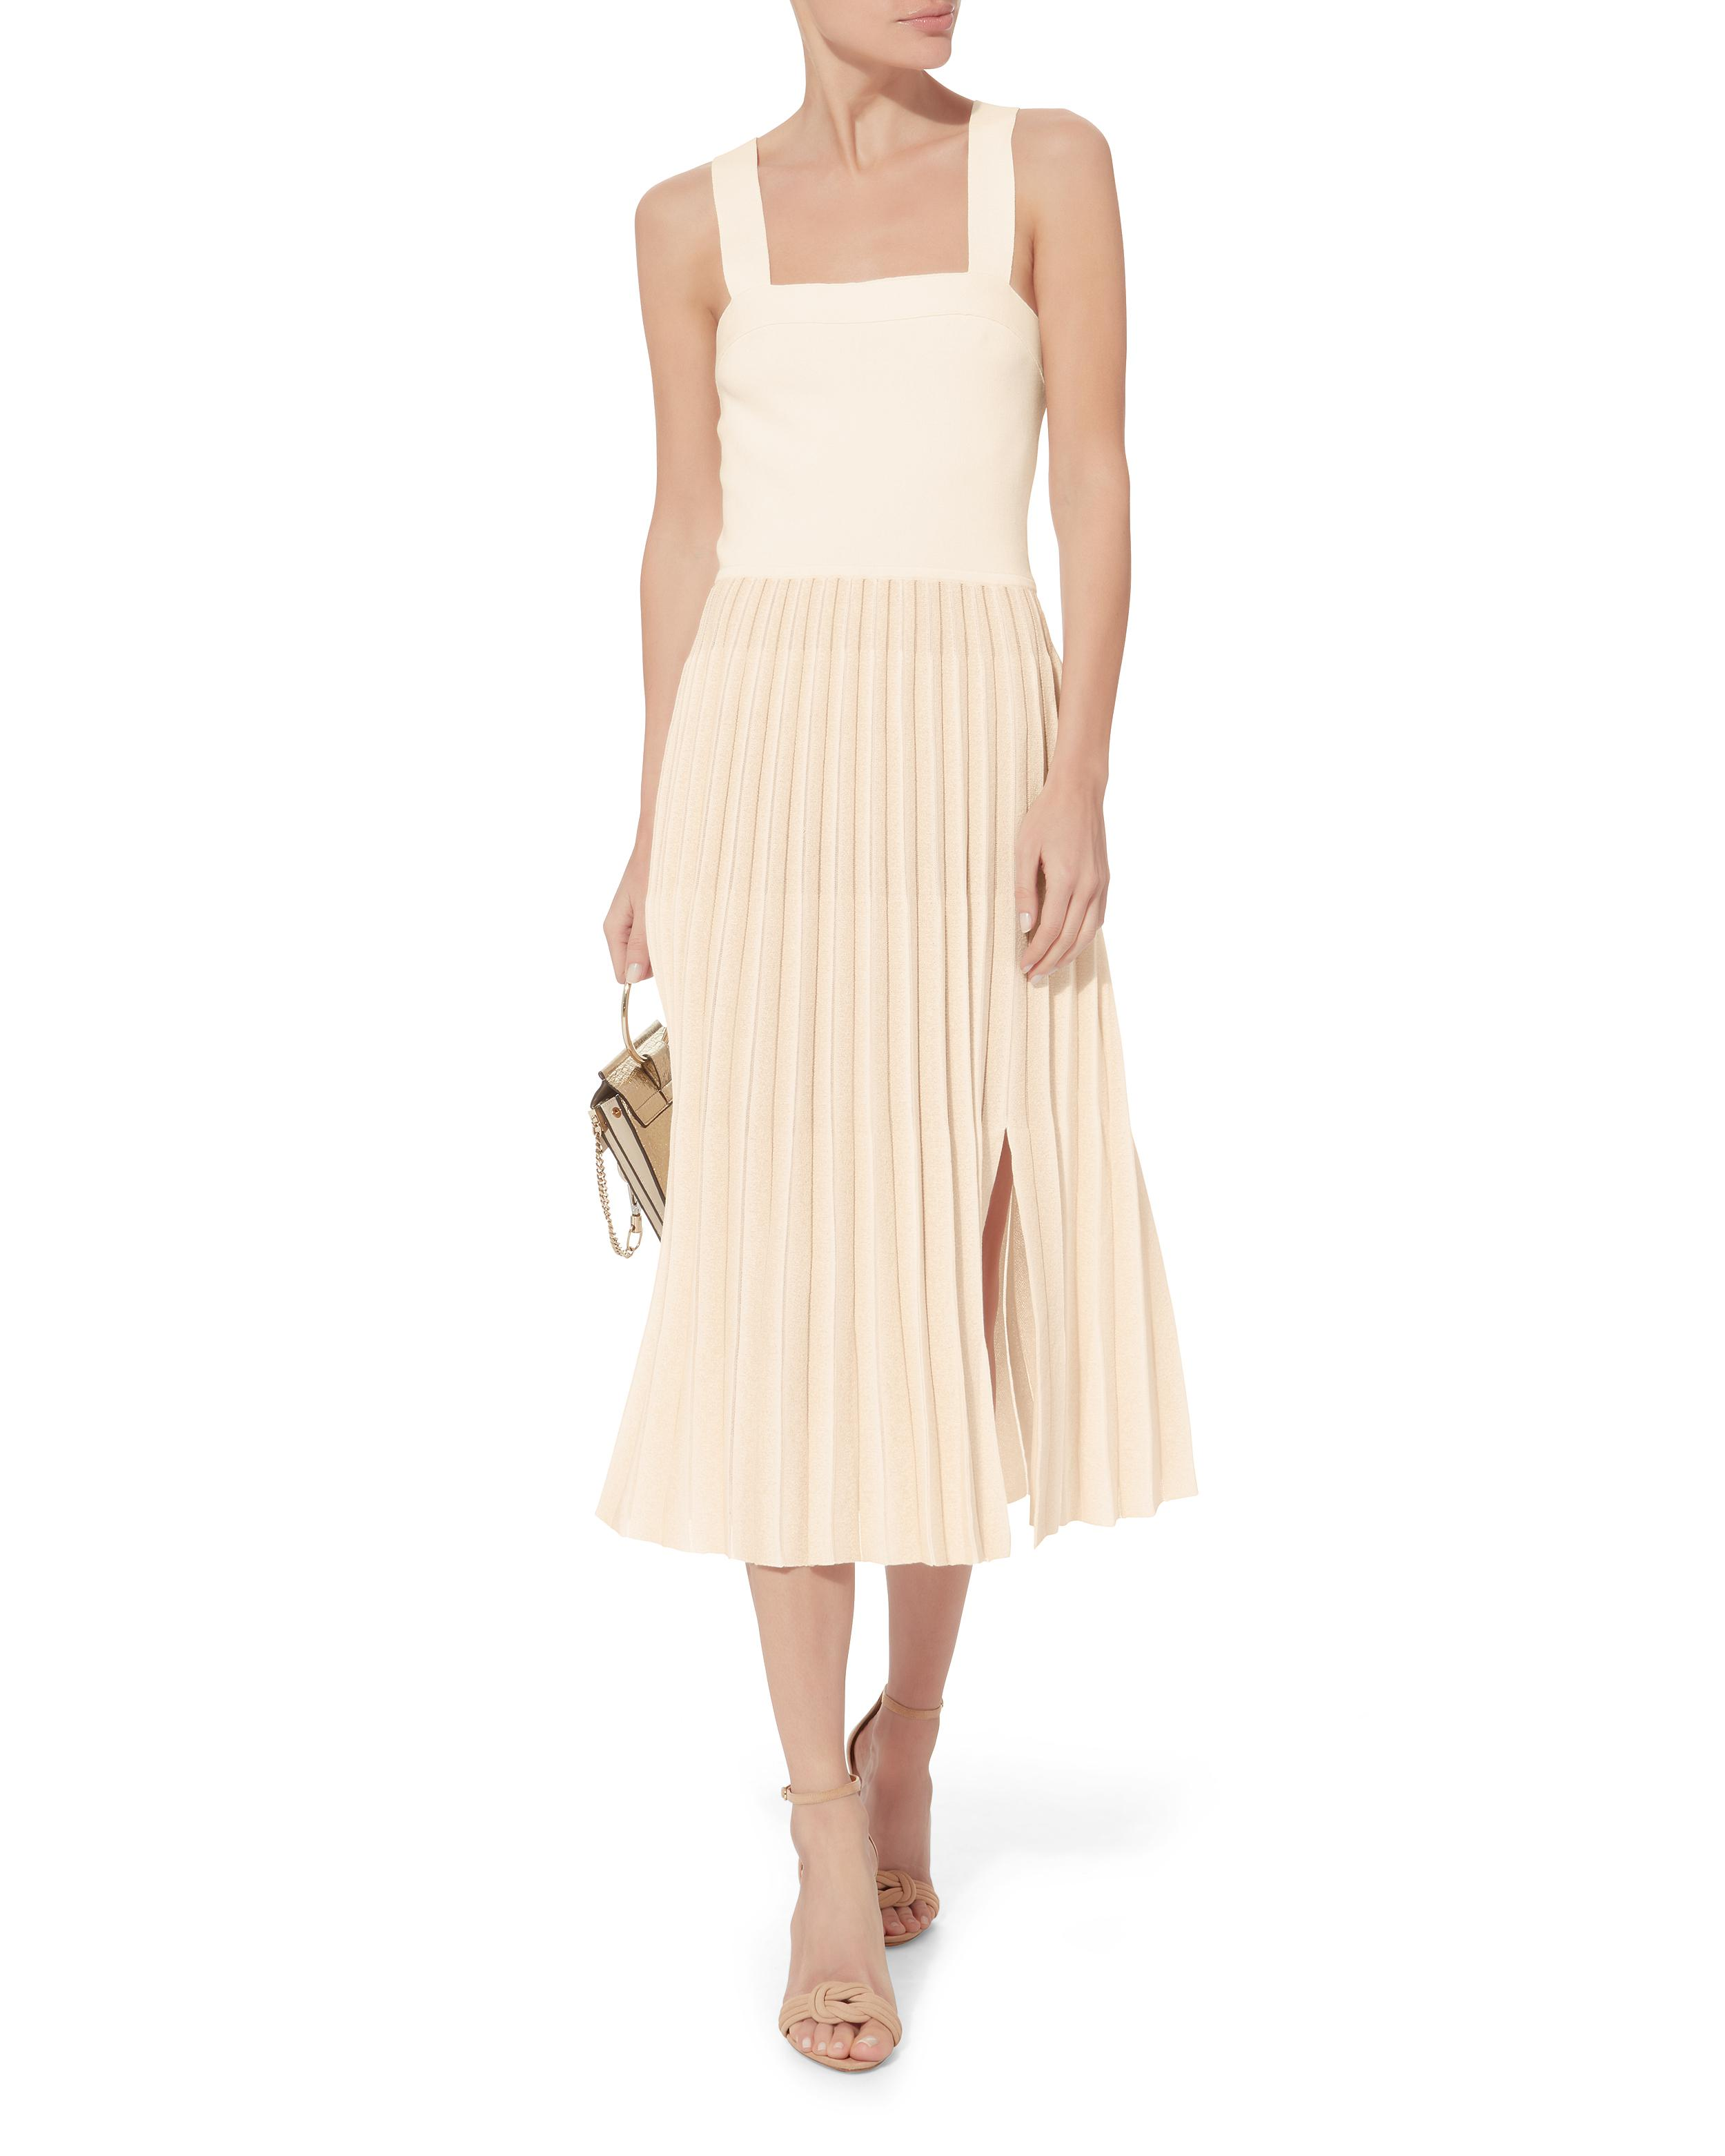 2a1a2b7556 10 Crosby Derek Lam Pleated Skirt Midi Dress in Natural - Lyst